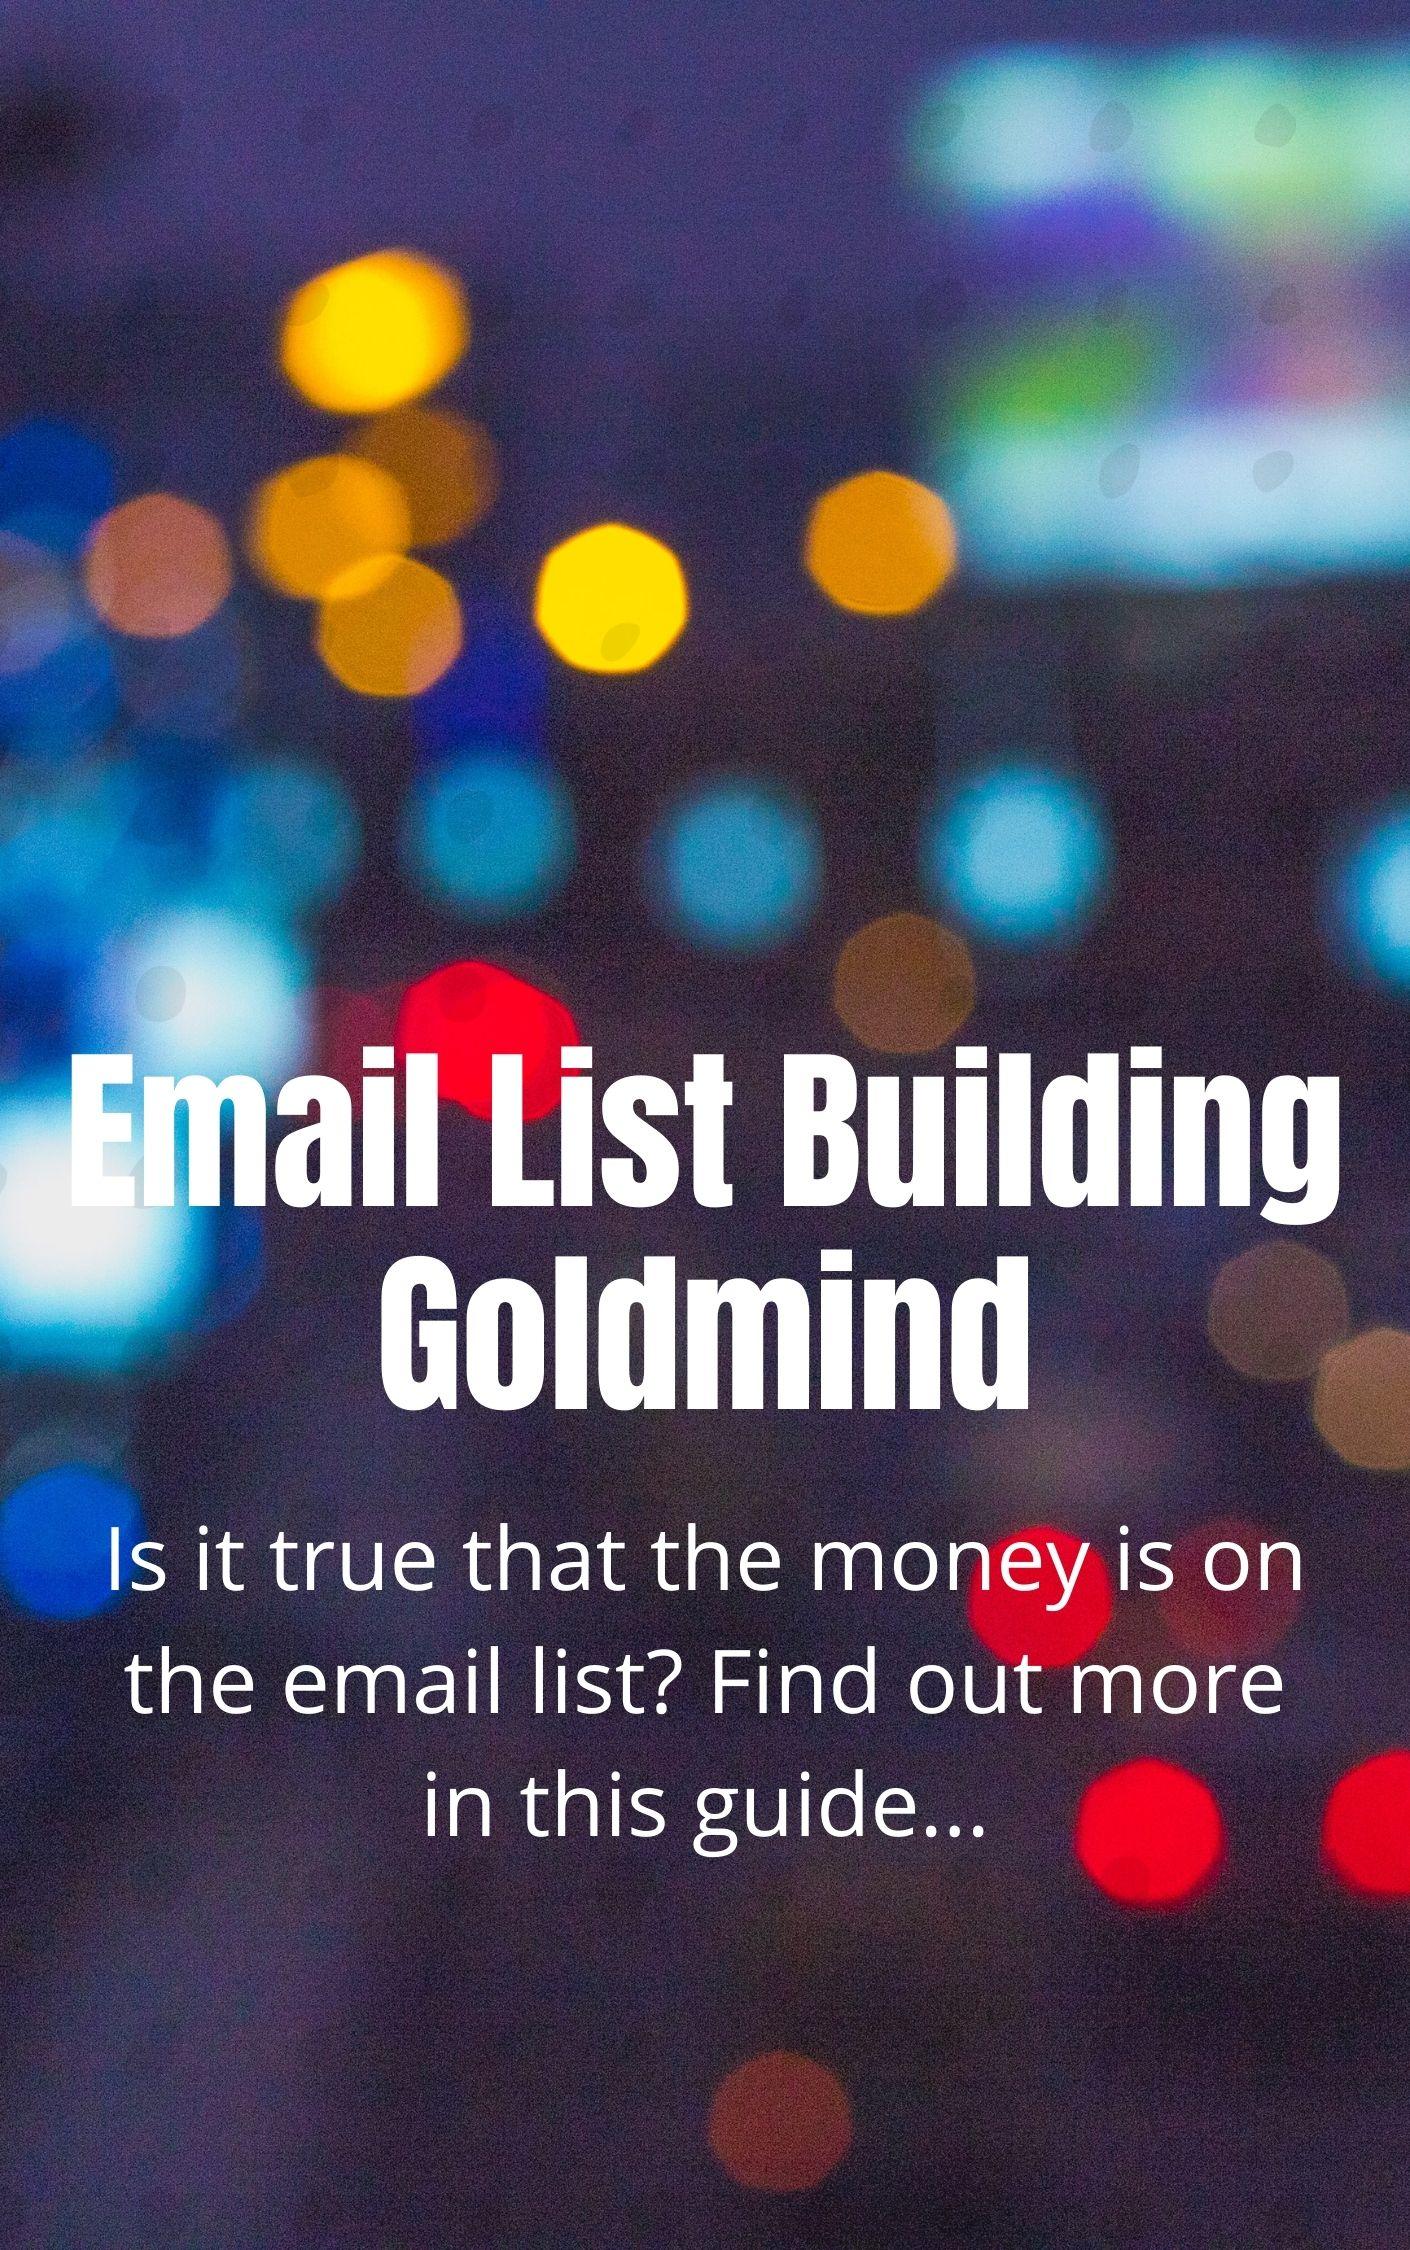 Emailmarketinggoldmind